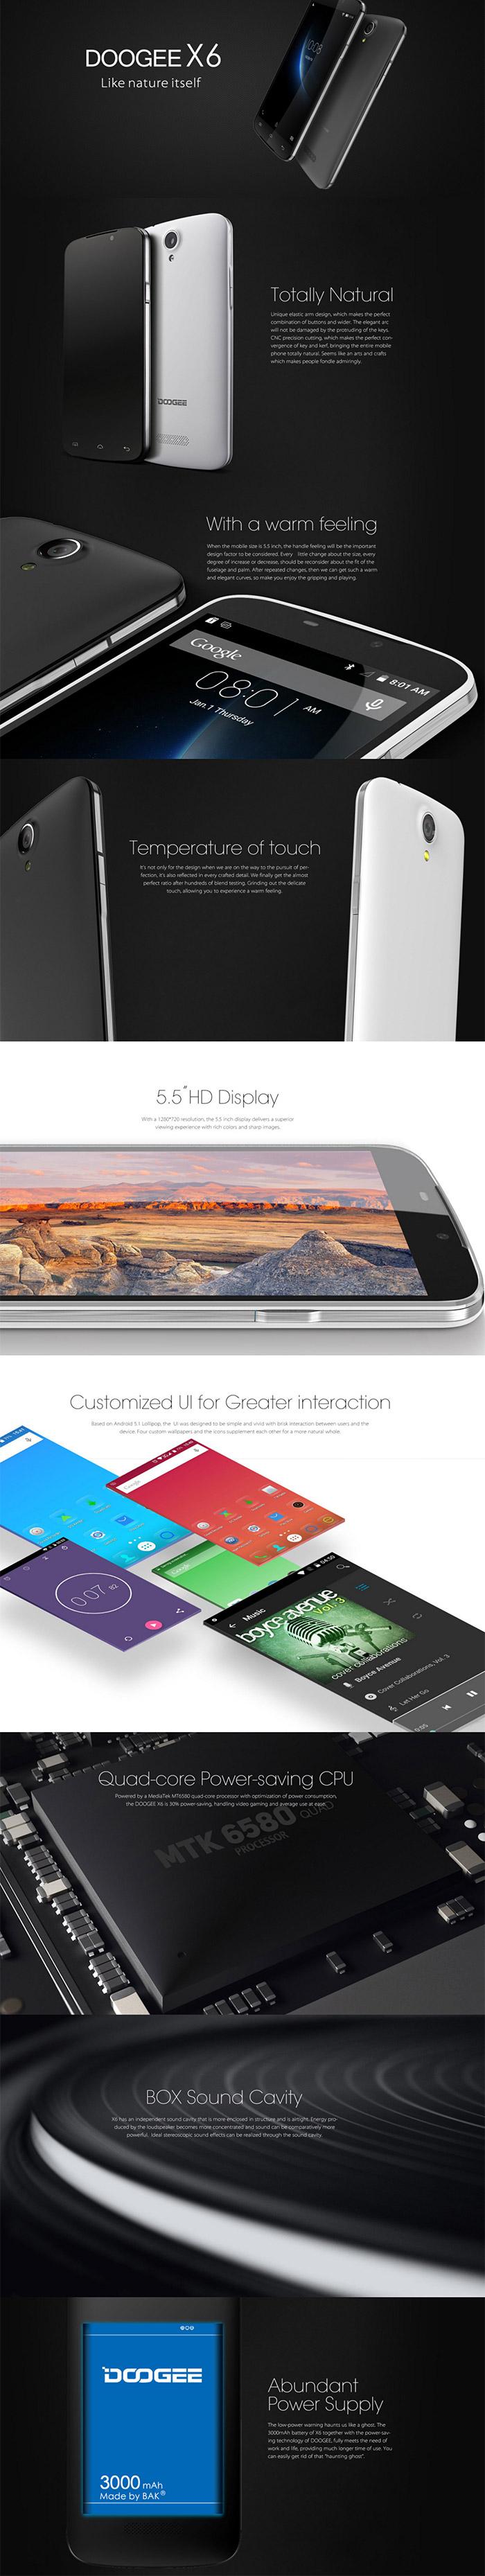 DooGee X6, две сим карти, смартфон спецификация